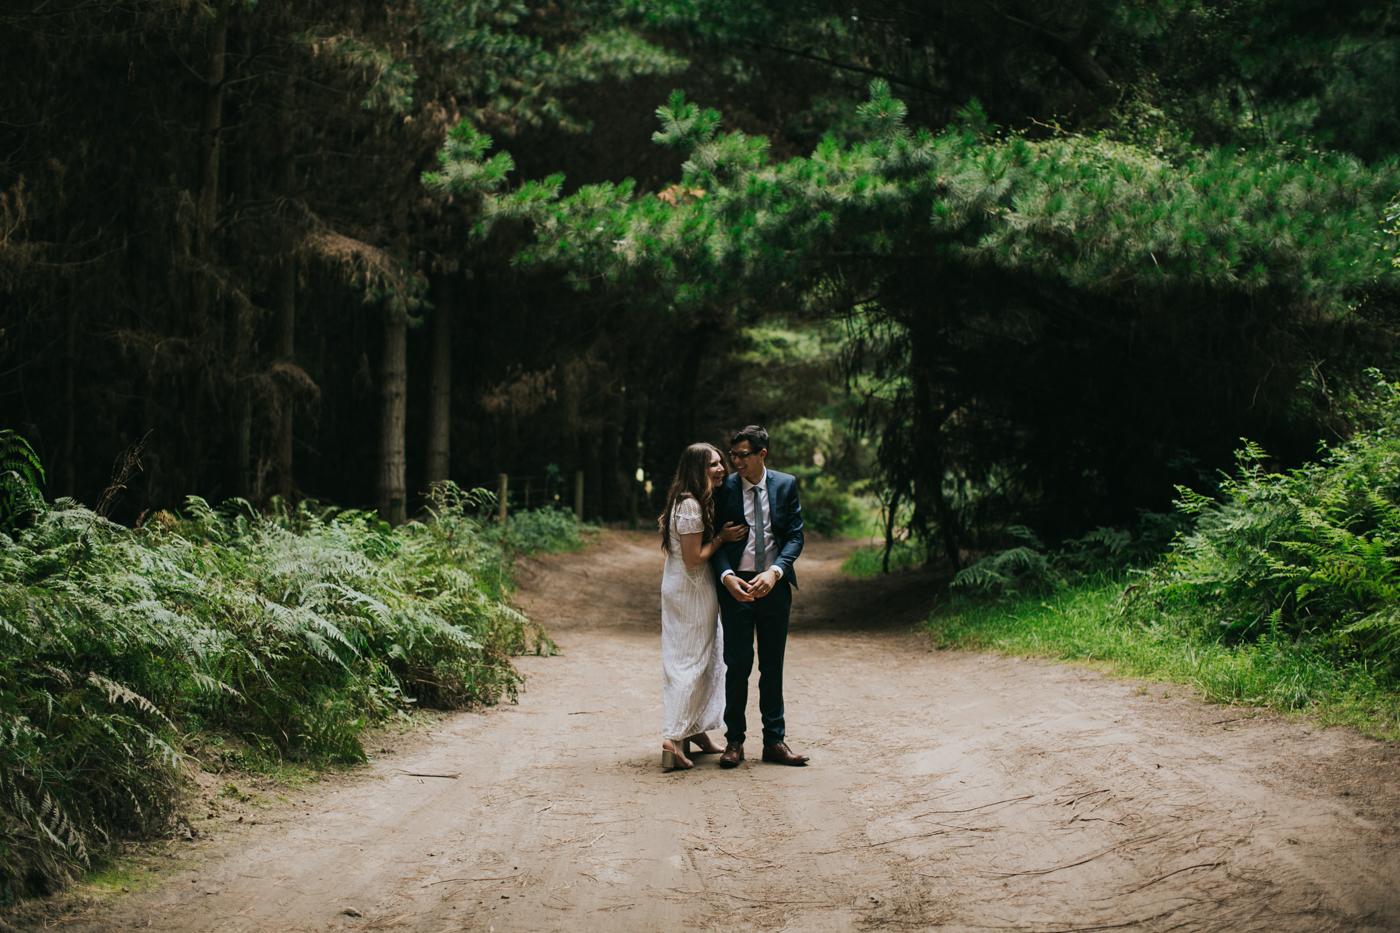 Ariana & Tim - Dunedin, New Zealand Wedding - Destination Wedding - Samantha Heather Photography-172.jpg